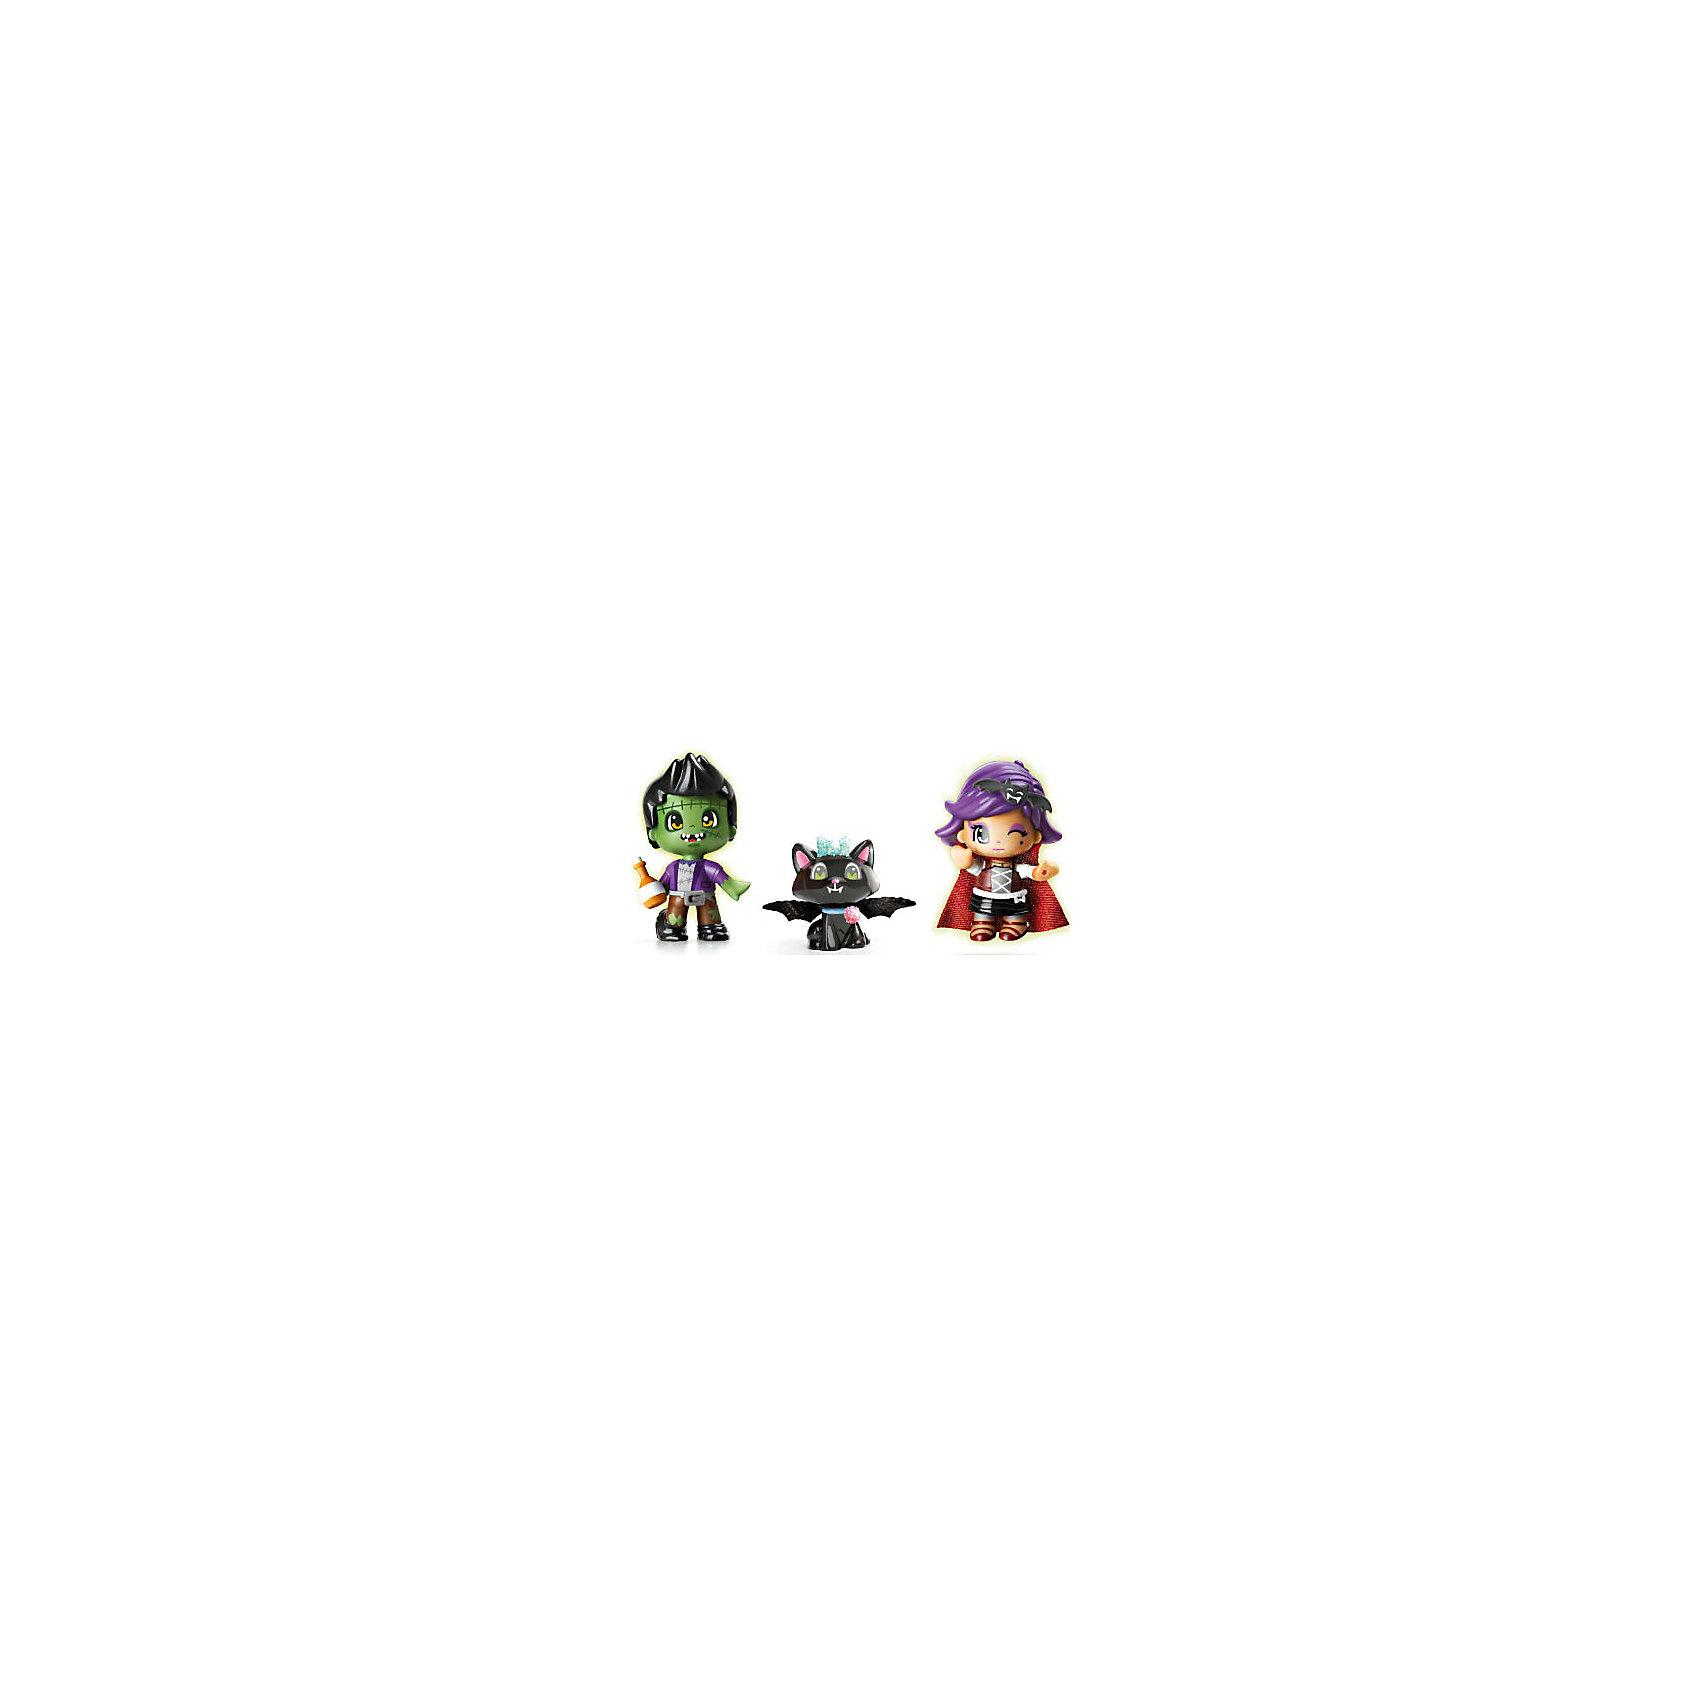 Famosa Игровой набор Пинипон, серия Monster, Famosa набор 2 кукол famosa пинипон чемпионы аксесс 2 в ассорт